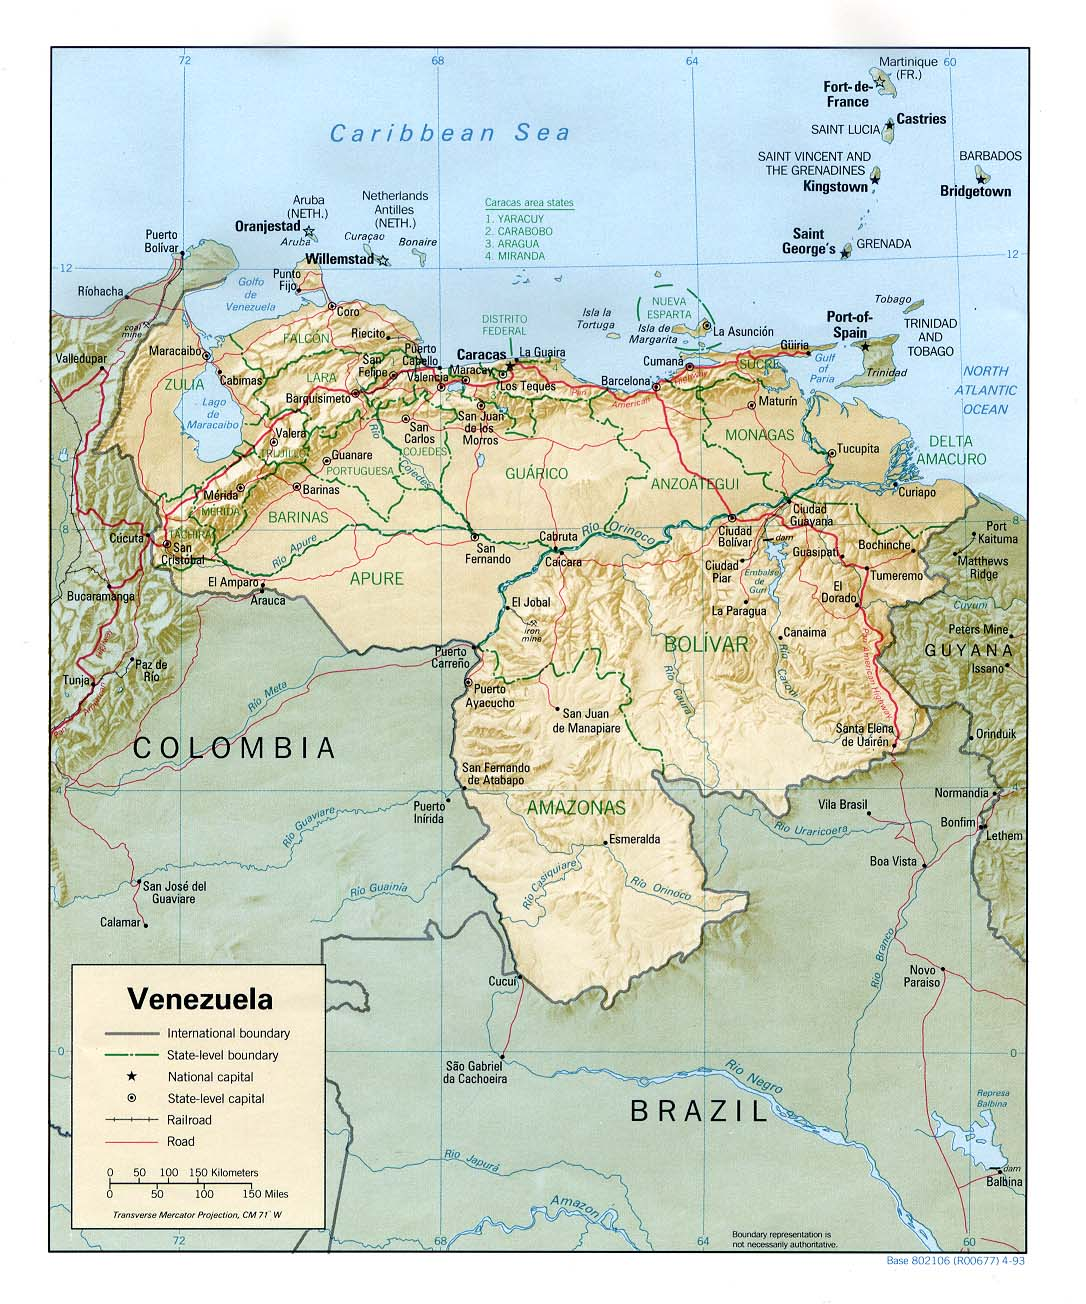 FileVenezuela Reljpg Wikimedia Commons - Aruba physical map